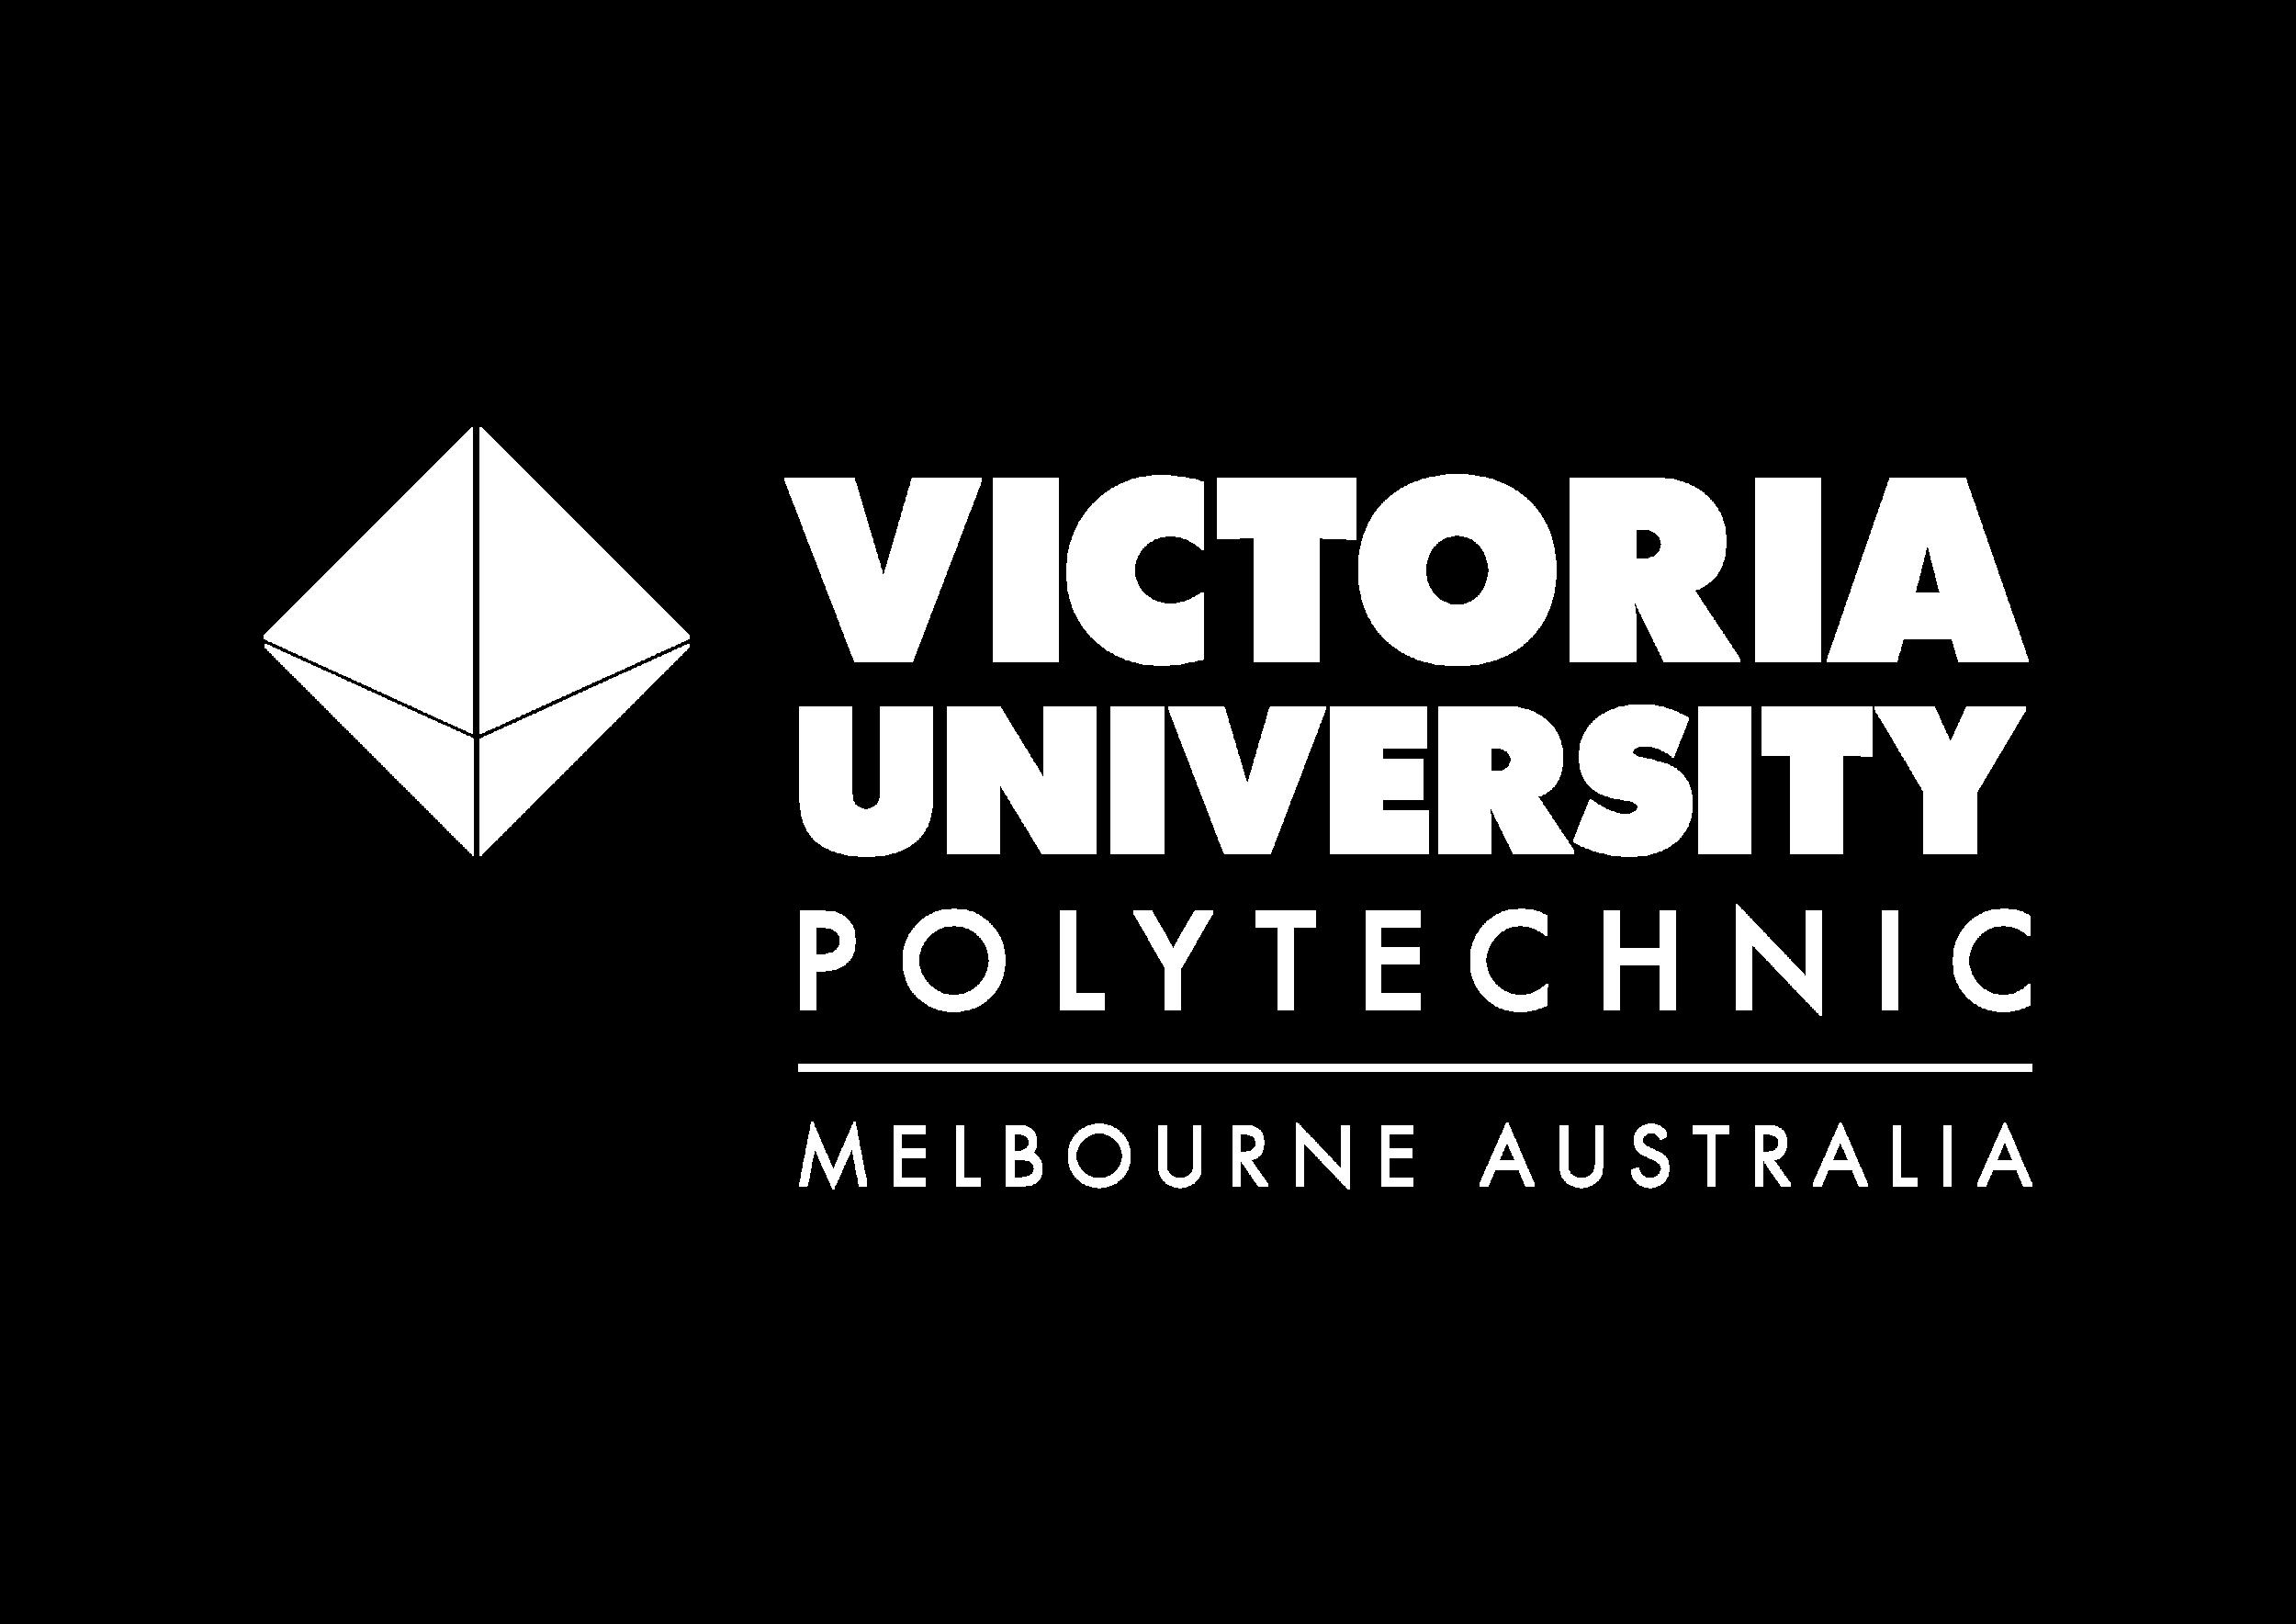 Victoria University Polytechnic